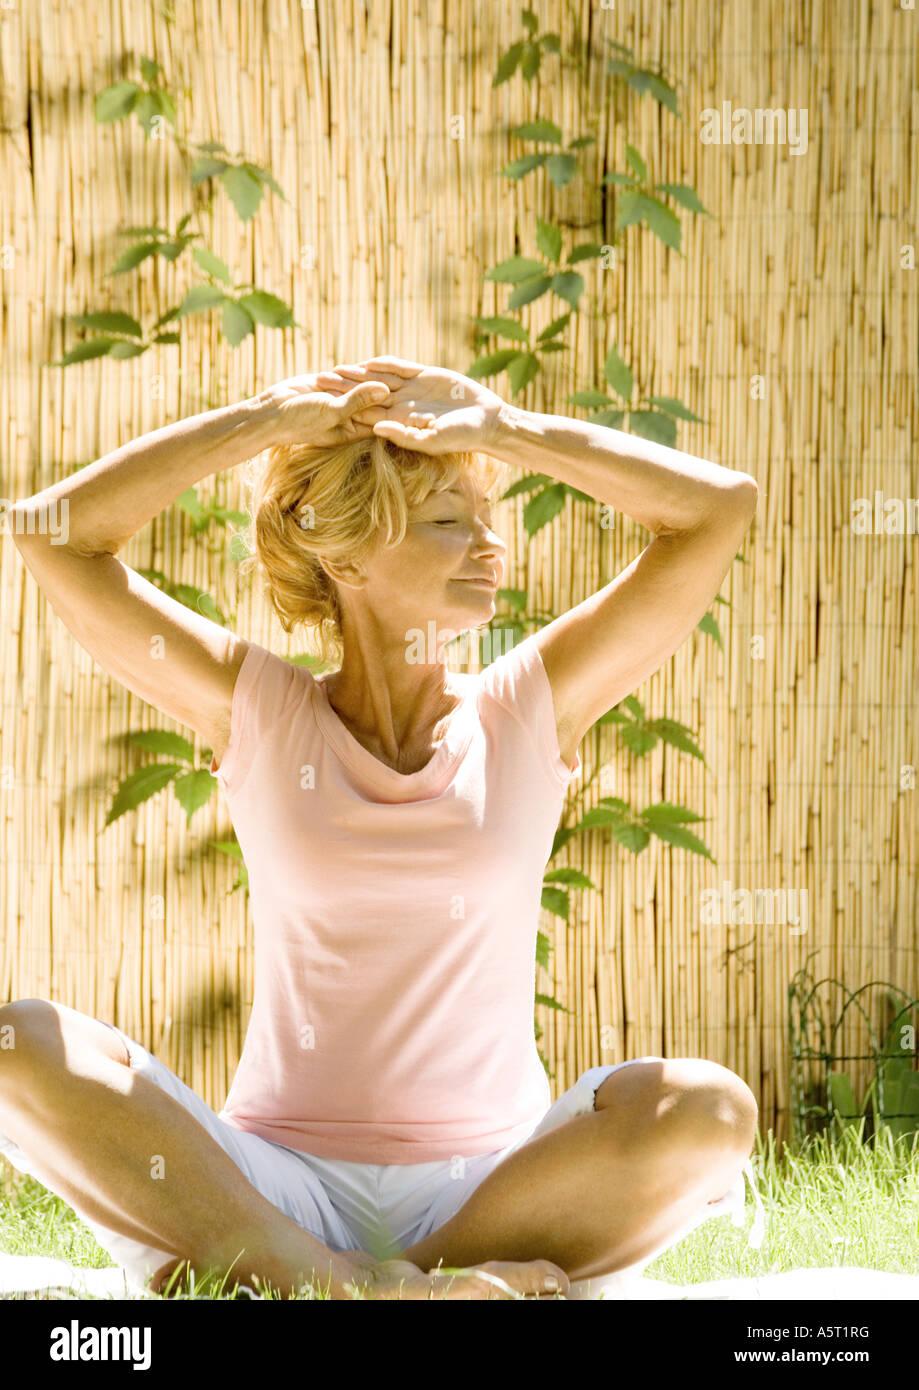 Senior woman doing exercise outdoors - Stock Image